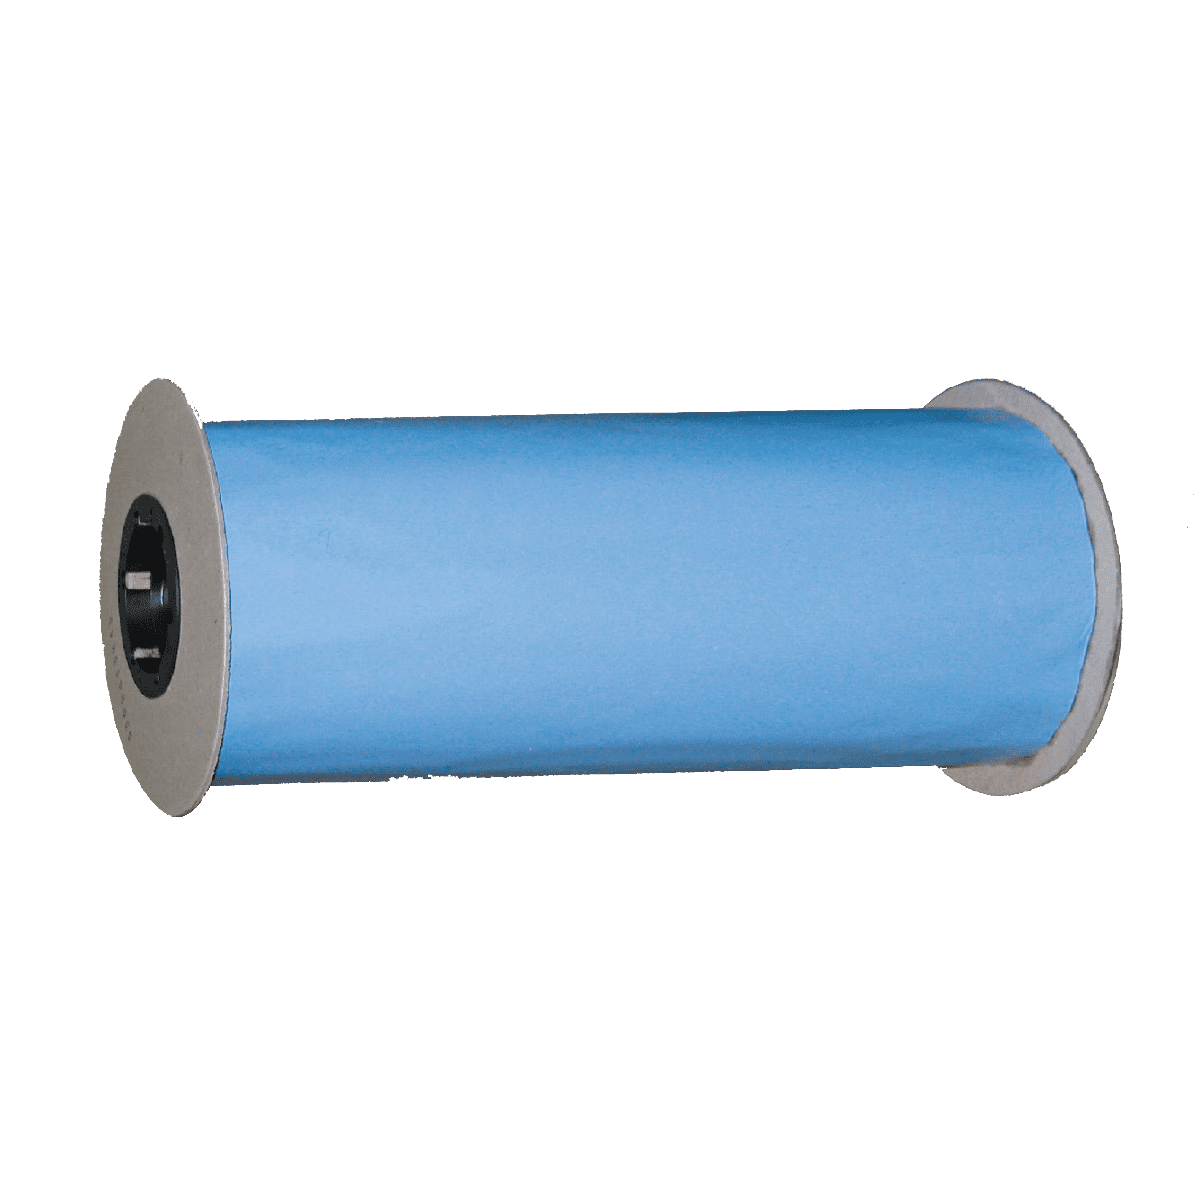 Biogard - Roll-Gard azzurro